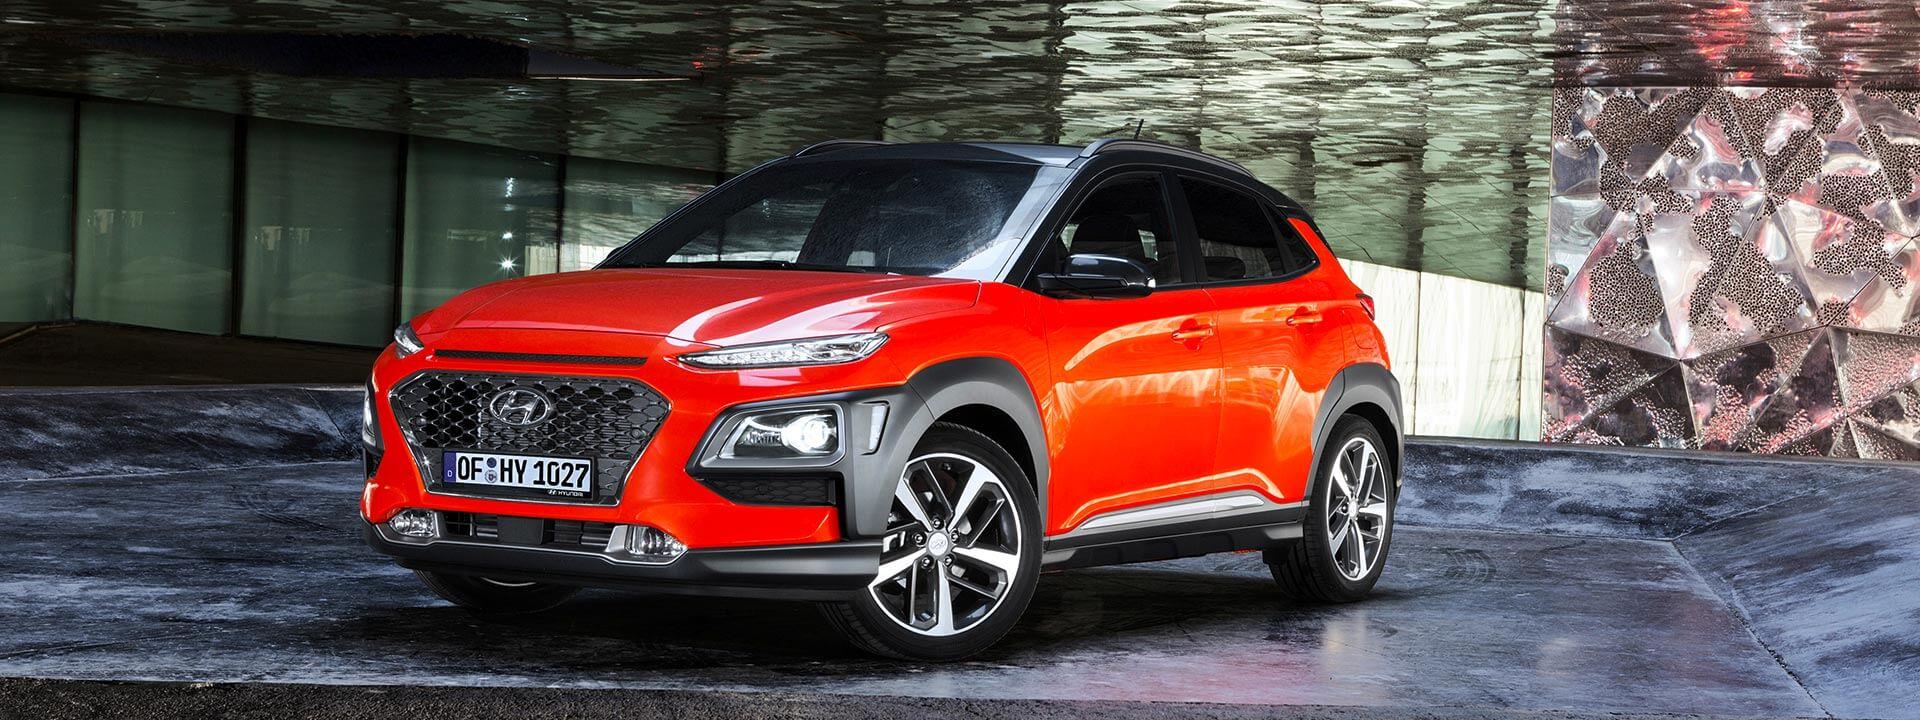 Бензиновая версия Hyundai Kona